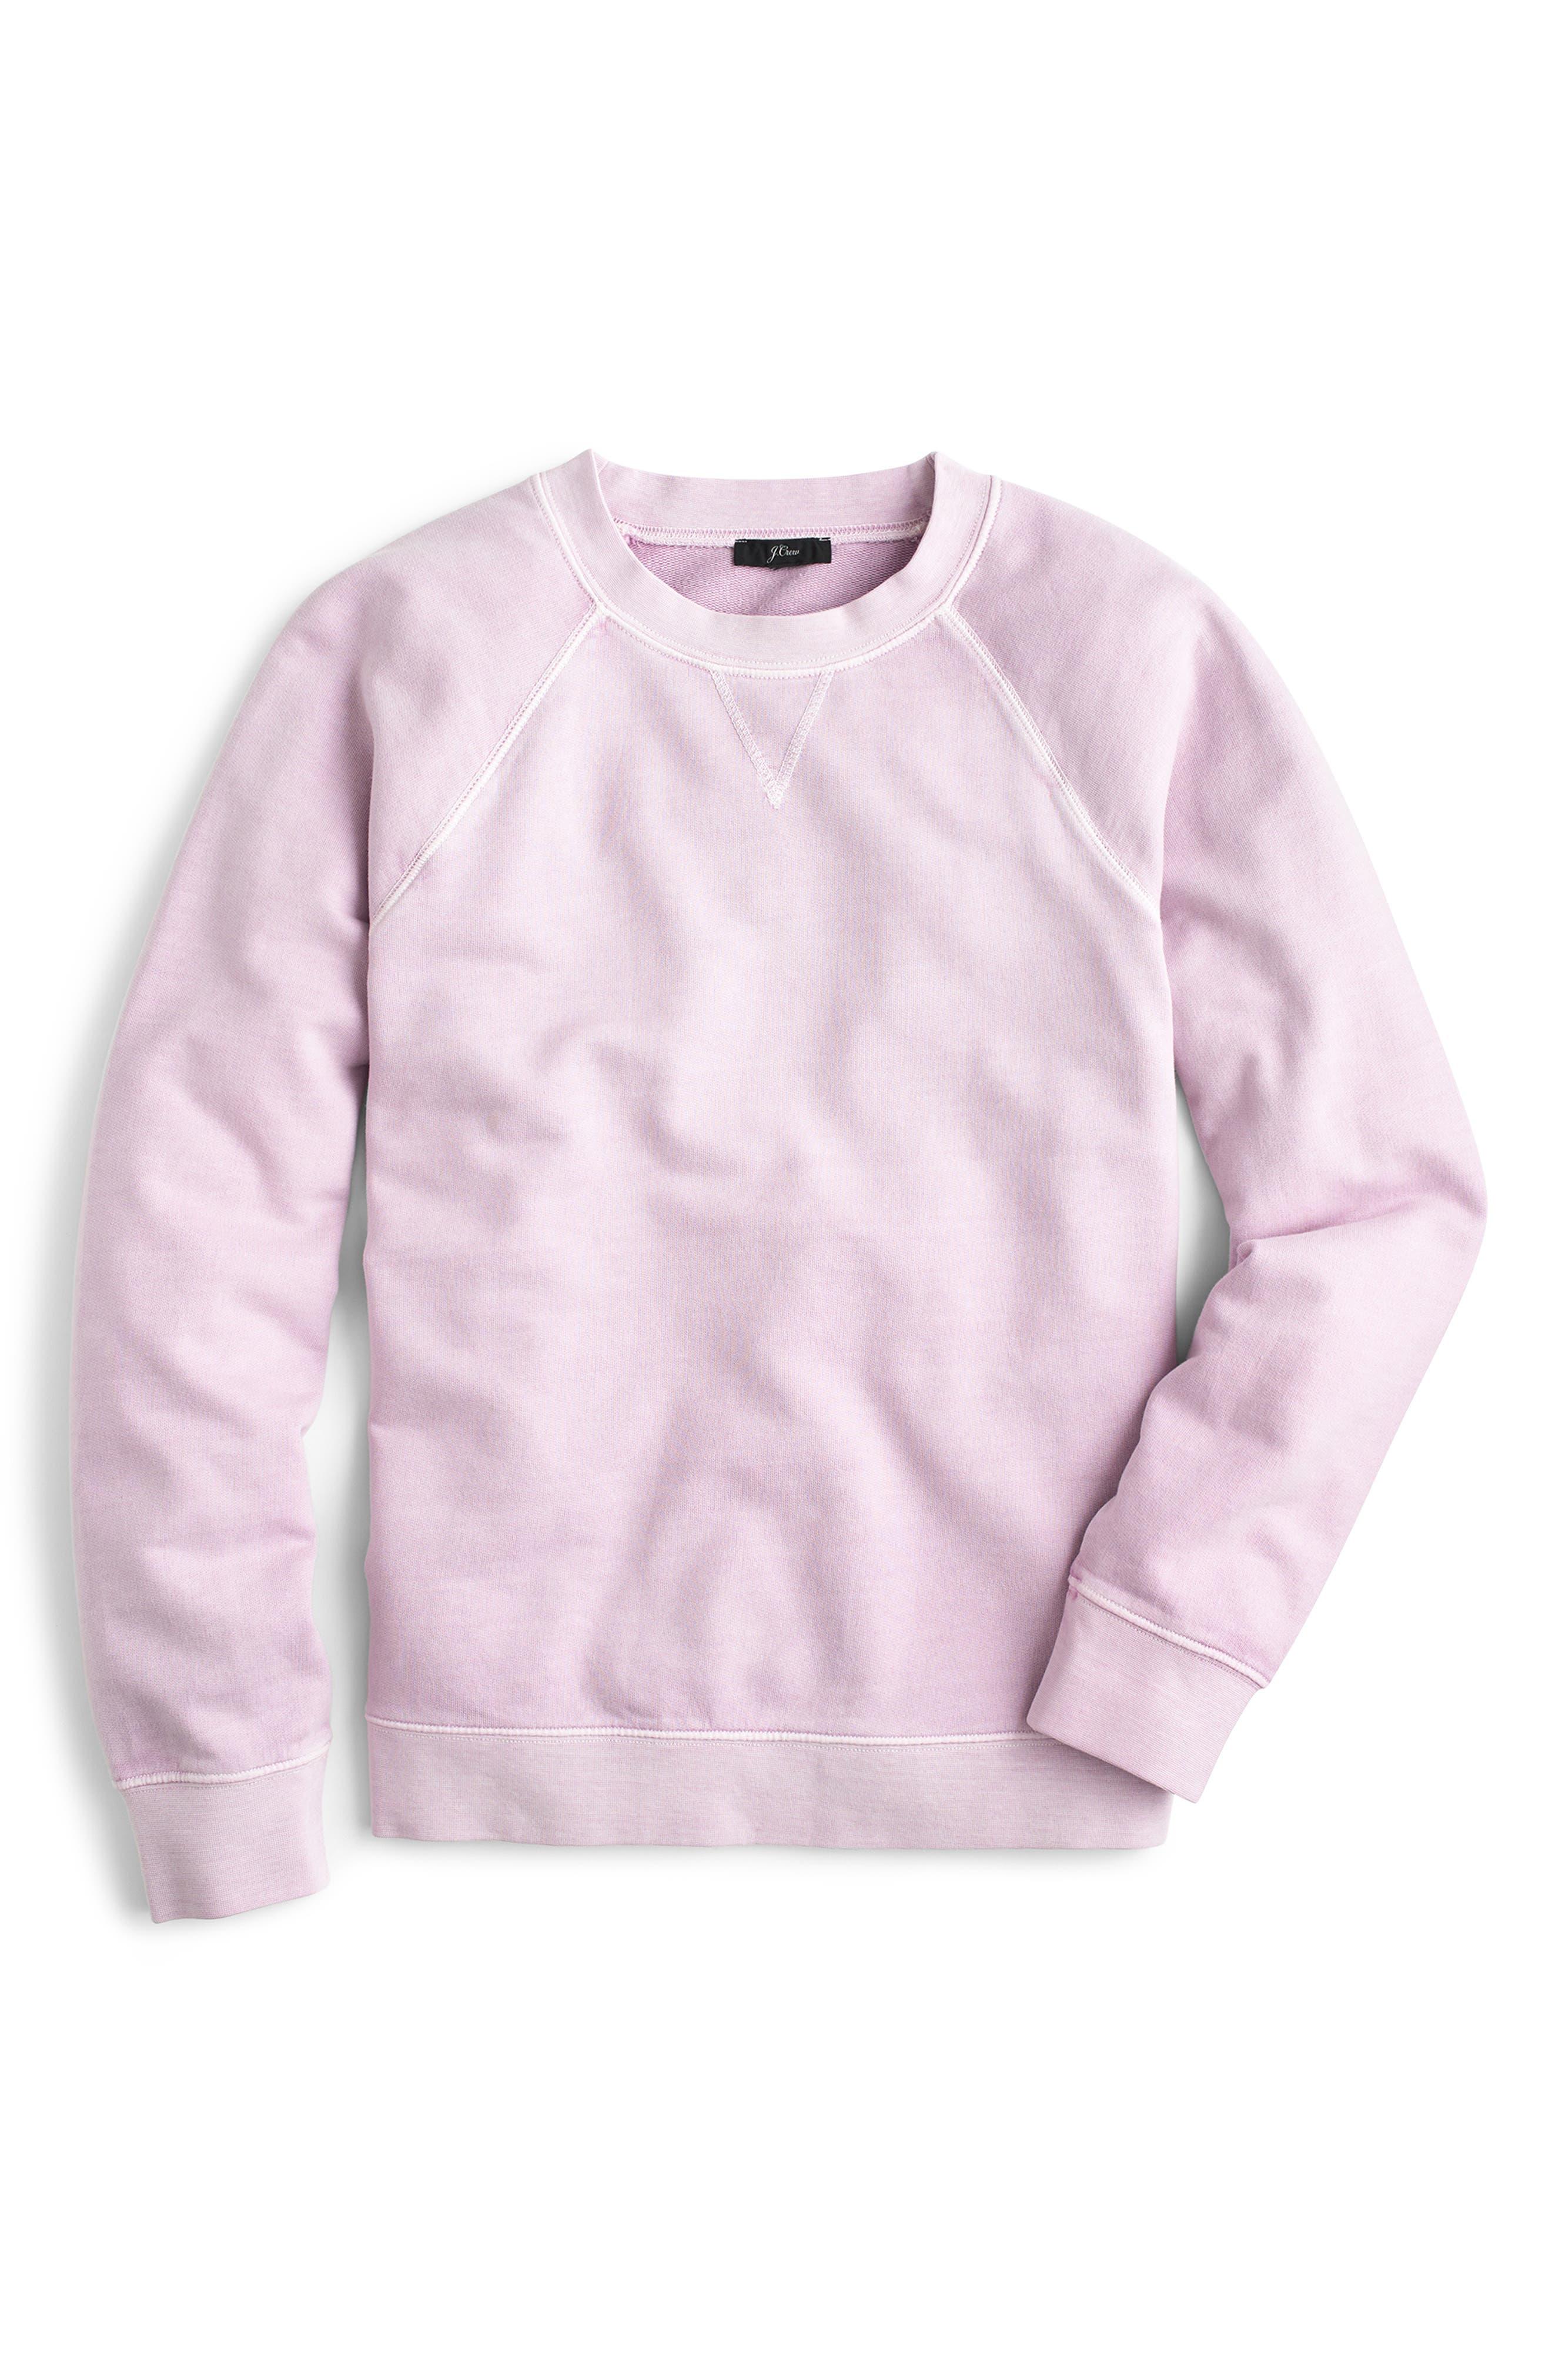 J.crew Garment Dyed Sweatshirt, Purple